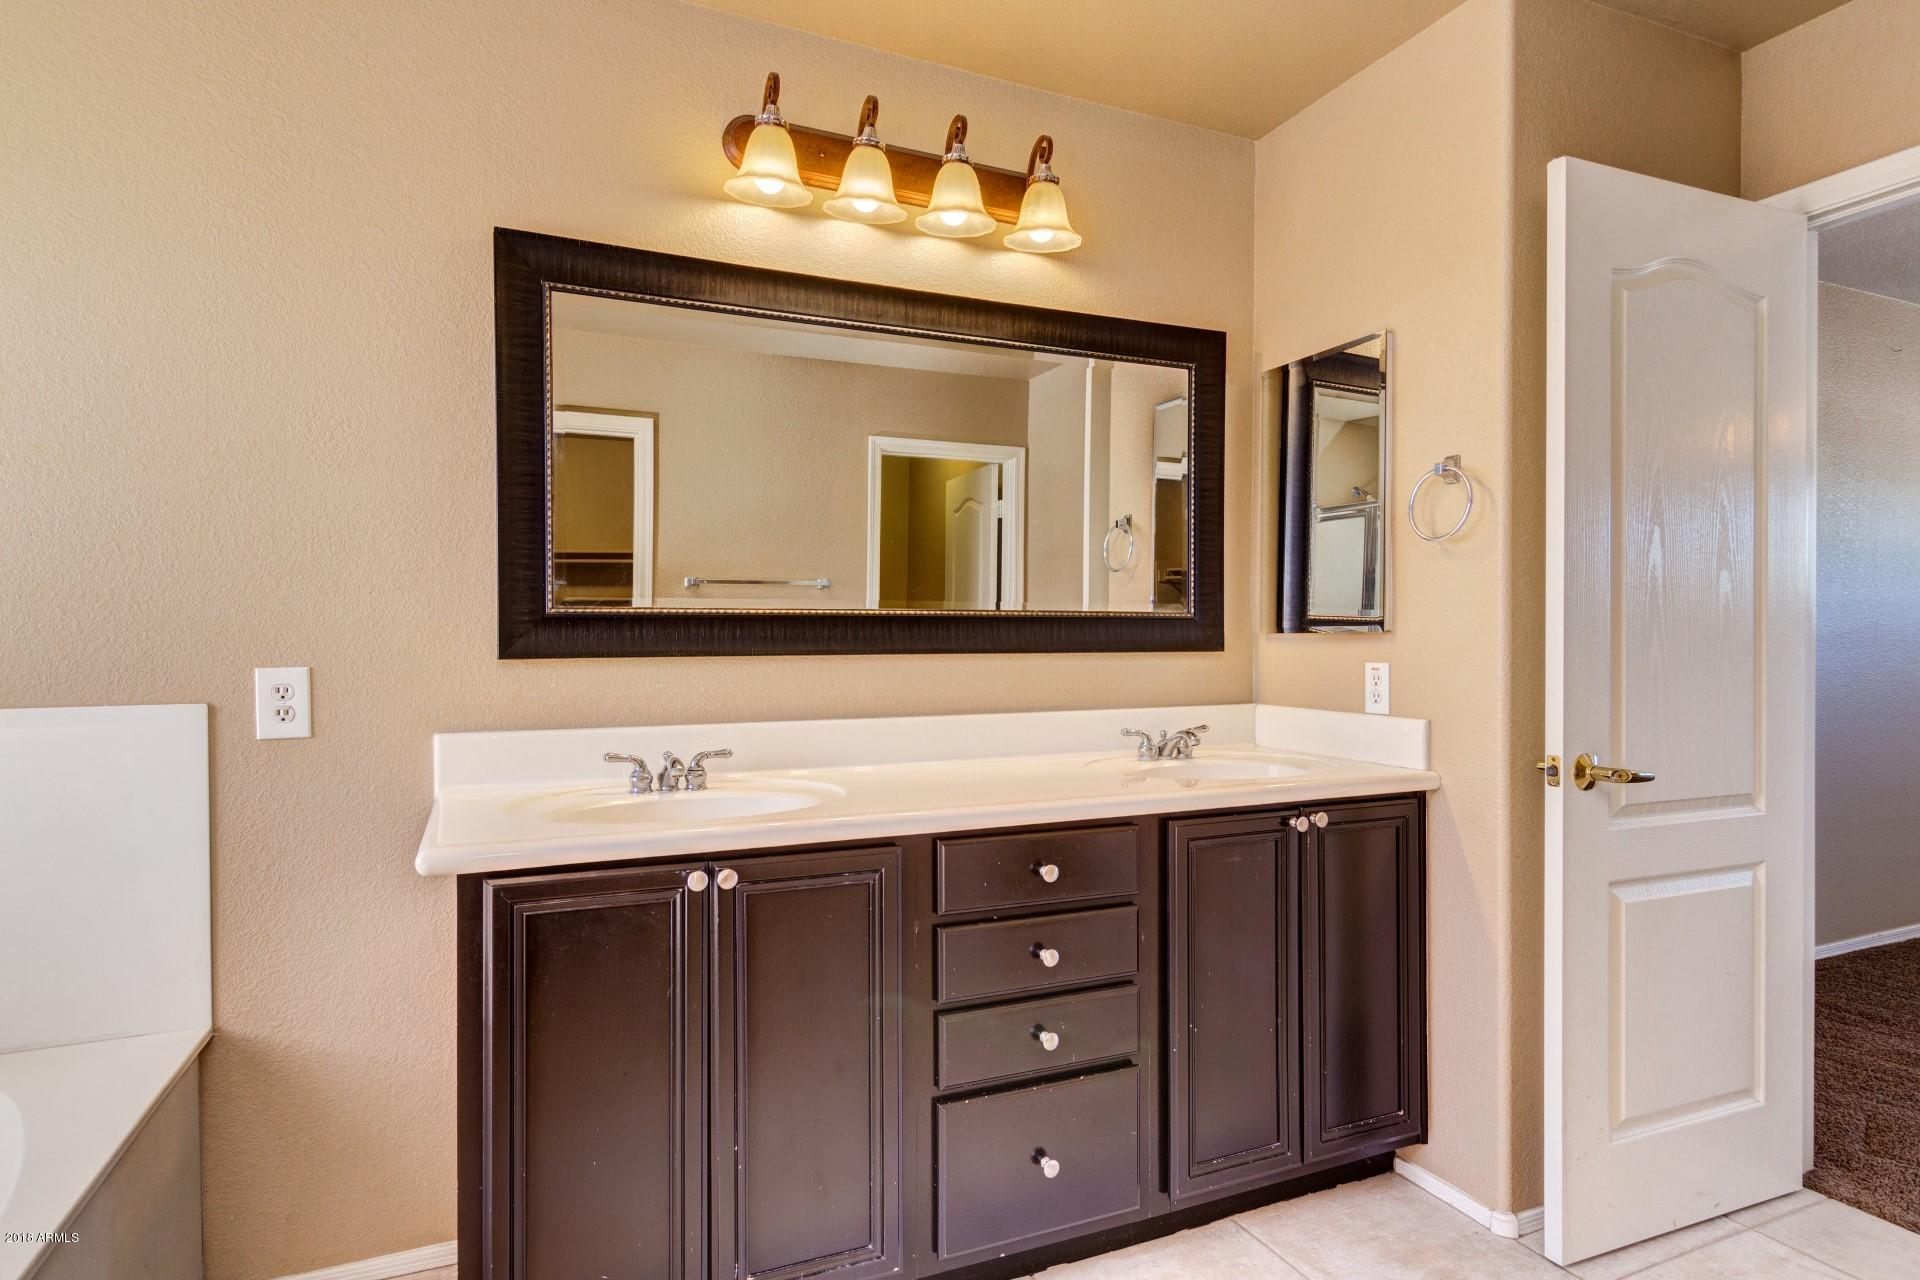 MLS 5817643 1225 E SAN CARLOS Way, Chandler, AZ 85249 Chandler AZ Chandler Heights Estates